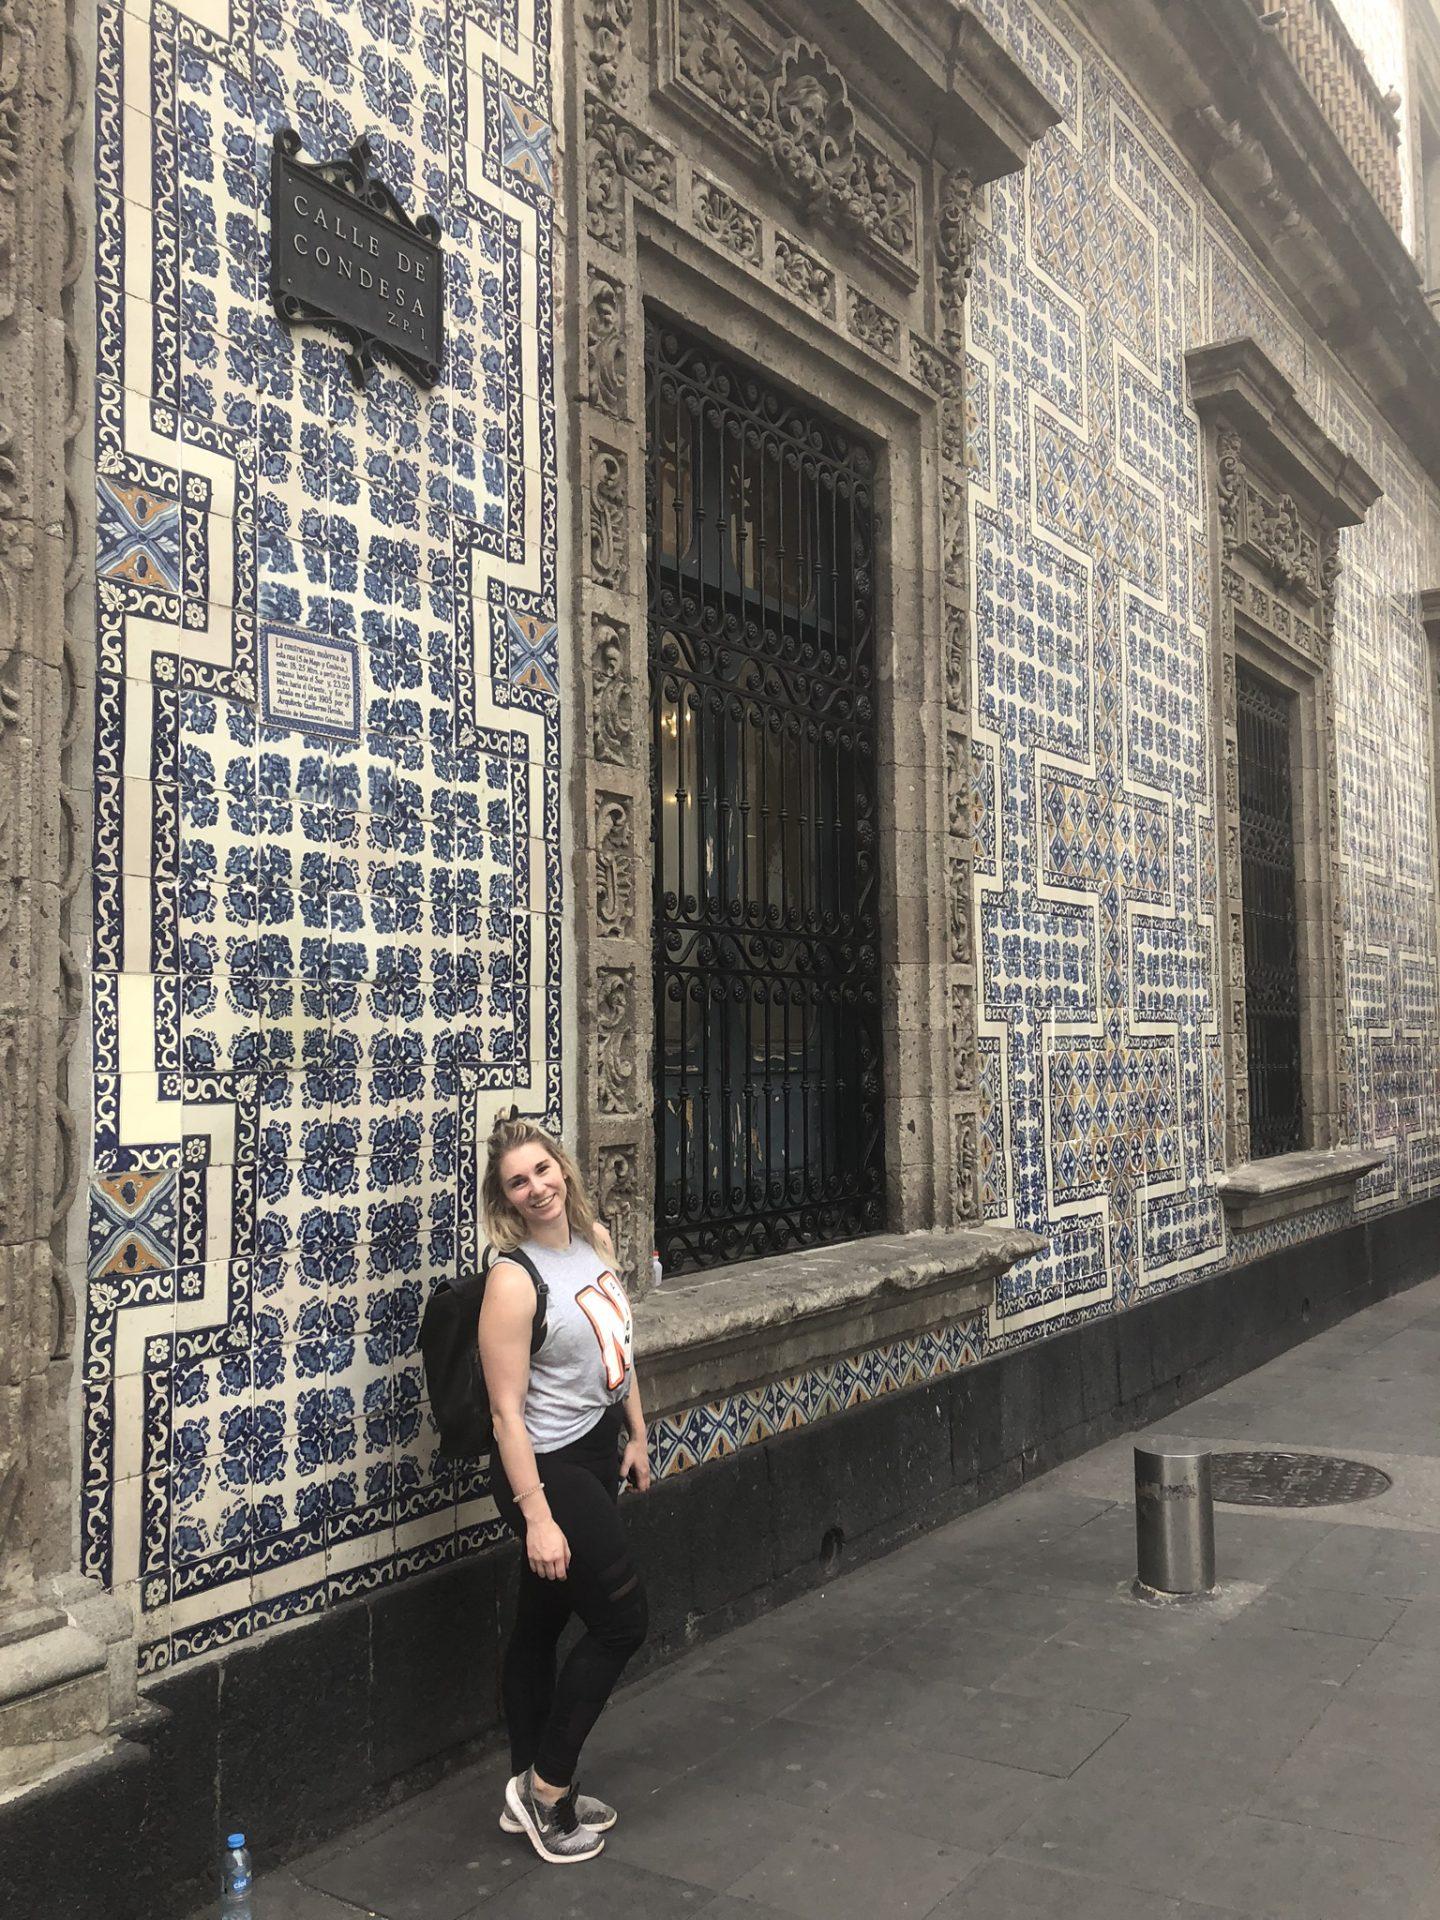 Girl outside The House of Tiles, or La Casa de Azulejos